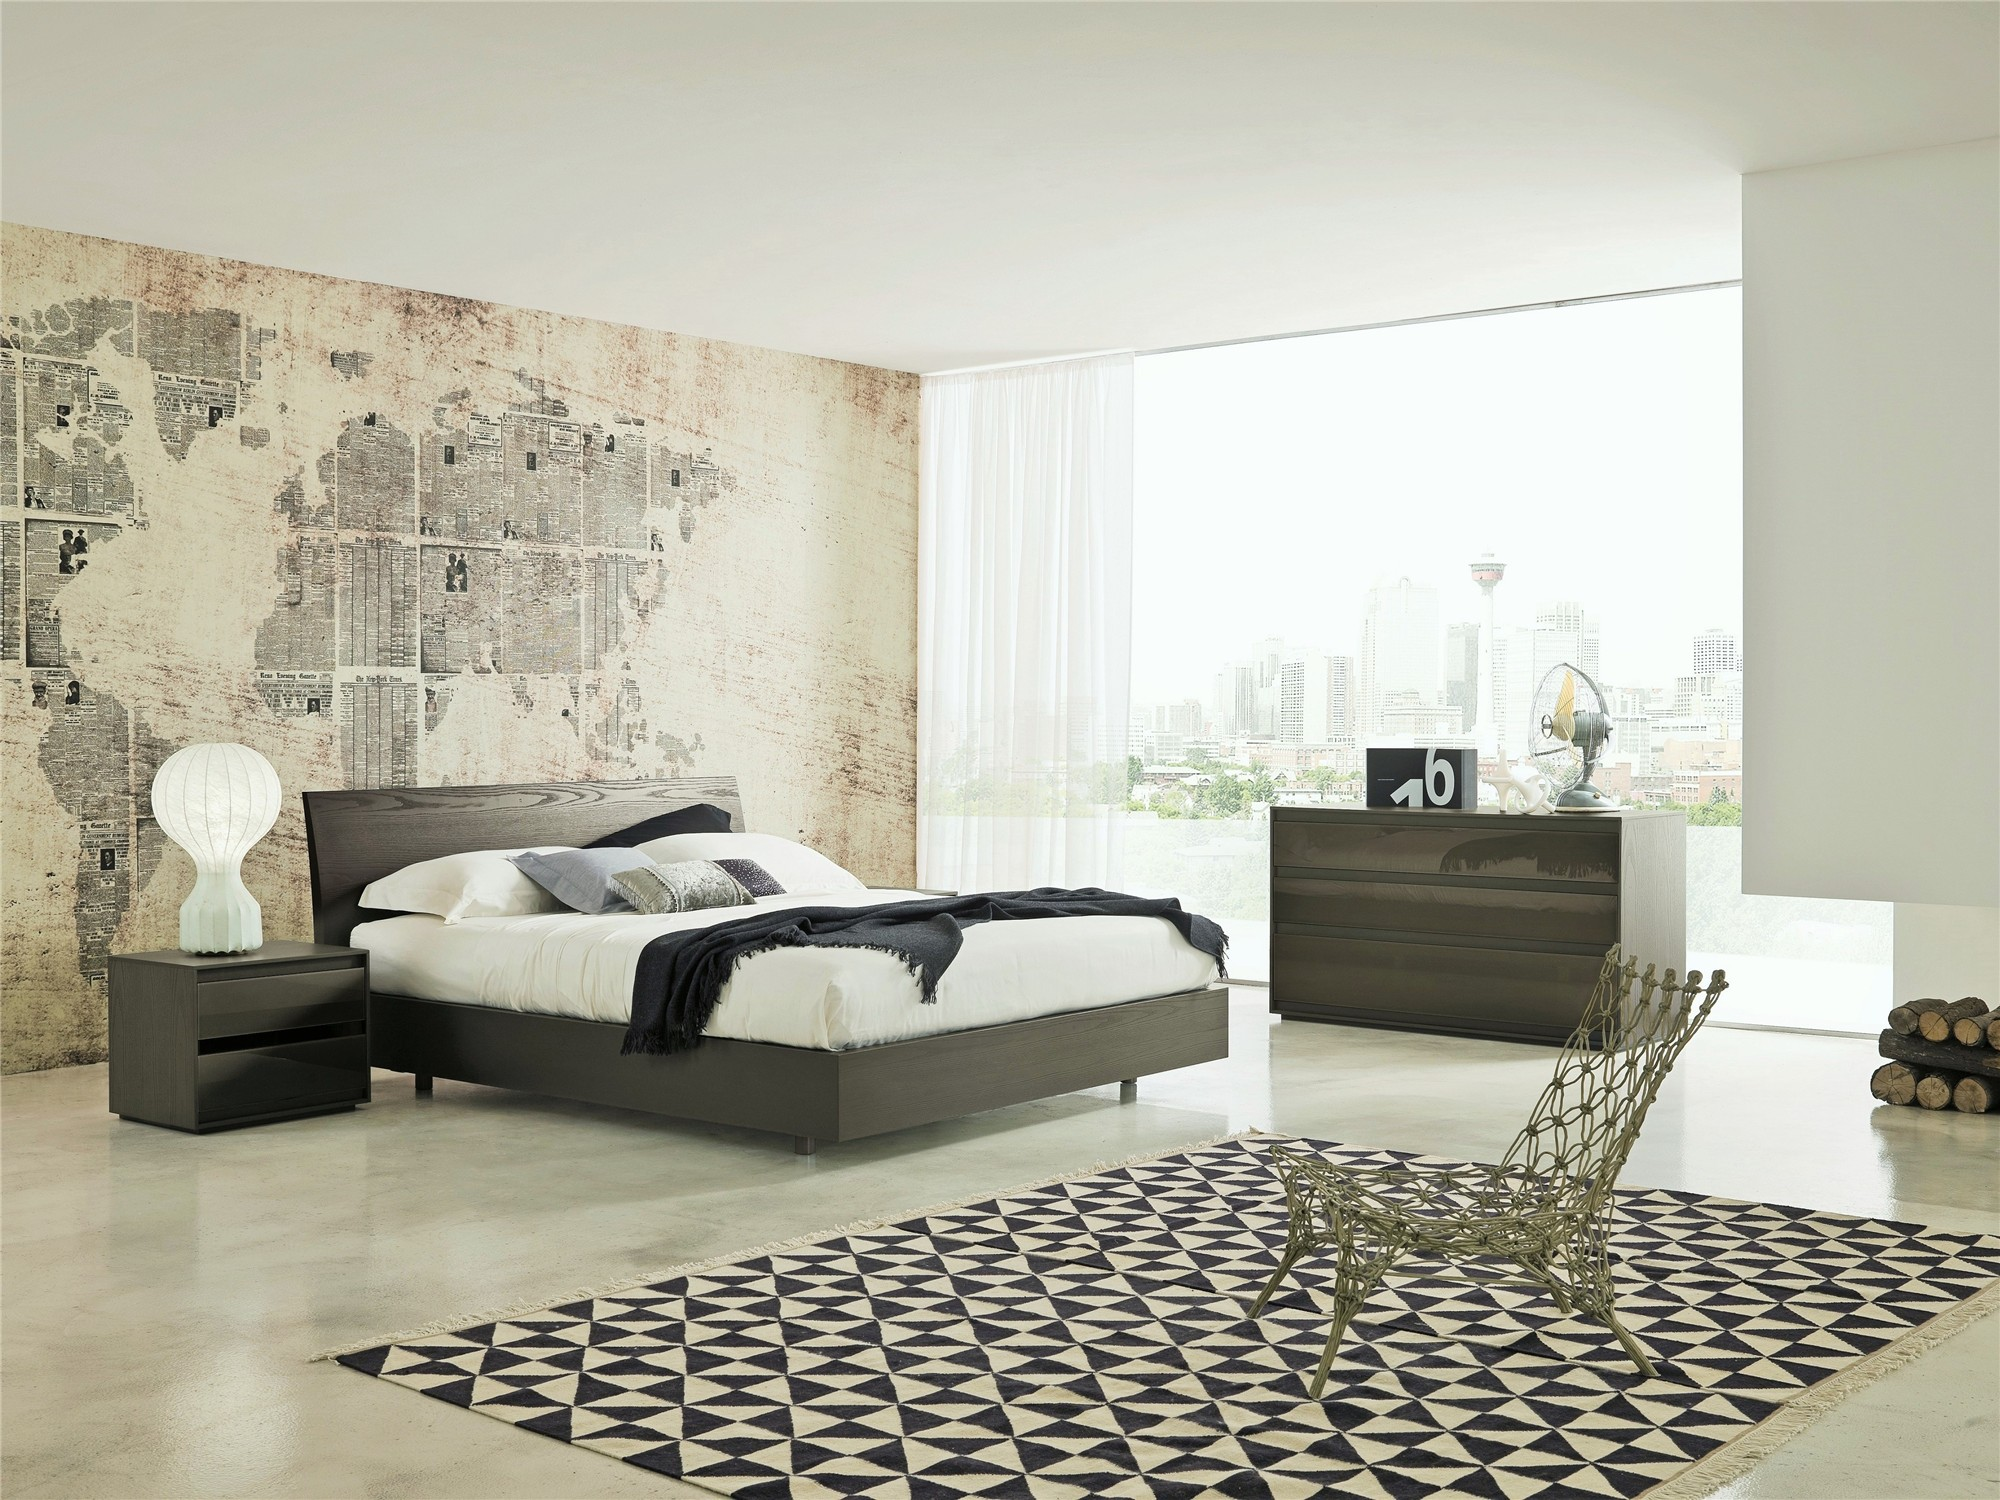 Oak Bedroom Veneran Italia Movi Italian Designer Bed In Solid Birch Oak